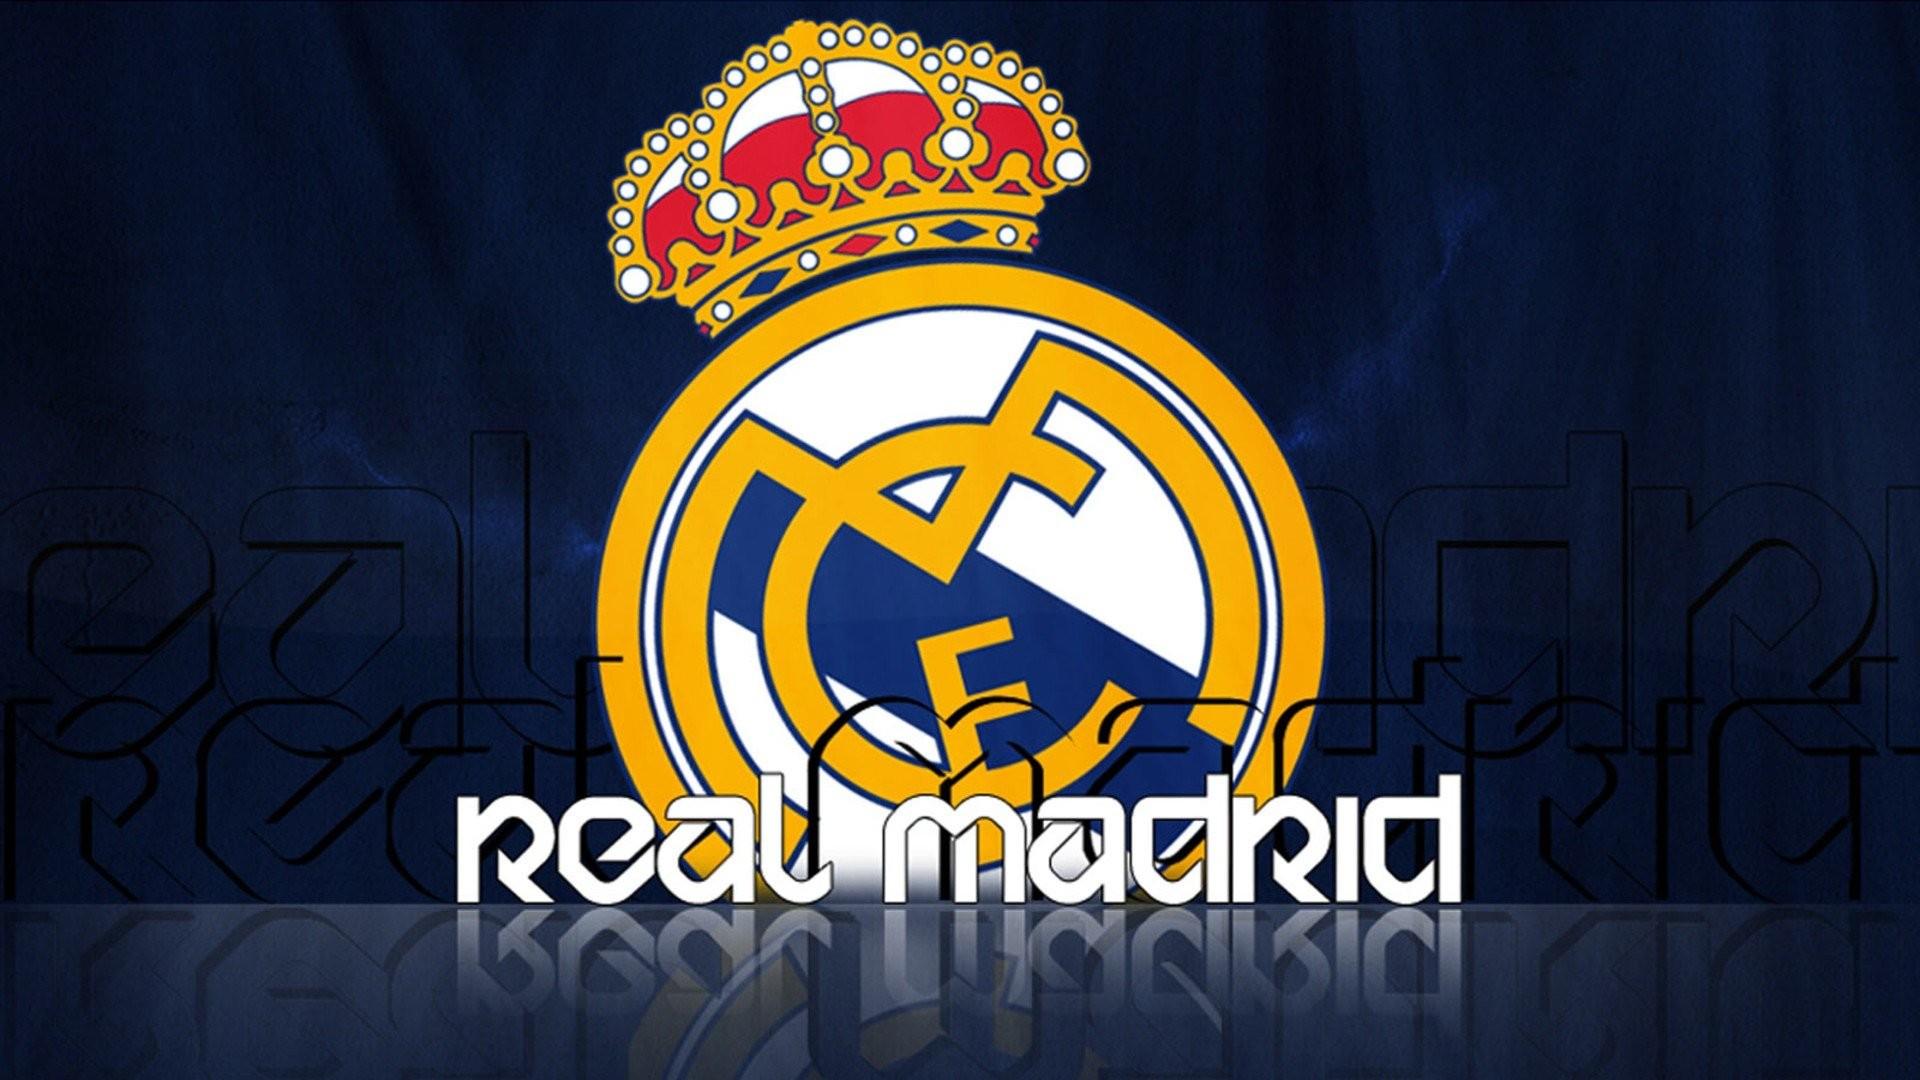 Sports soccer Real Madrid football teams Football Logos wallpaper |  | 286472 | WallpaperUP